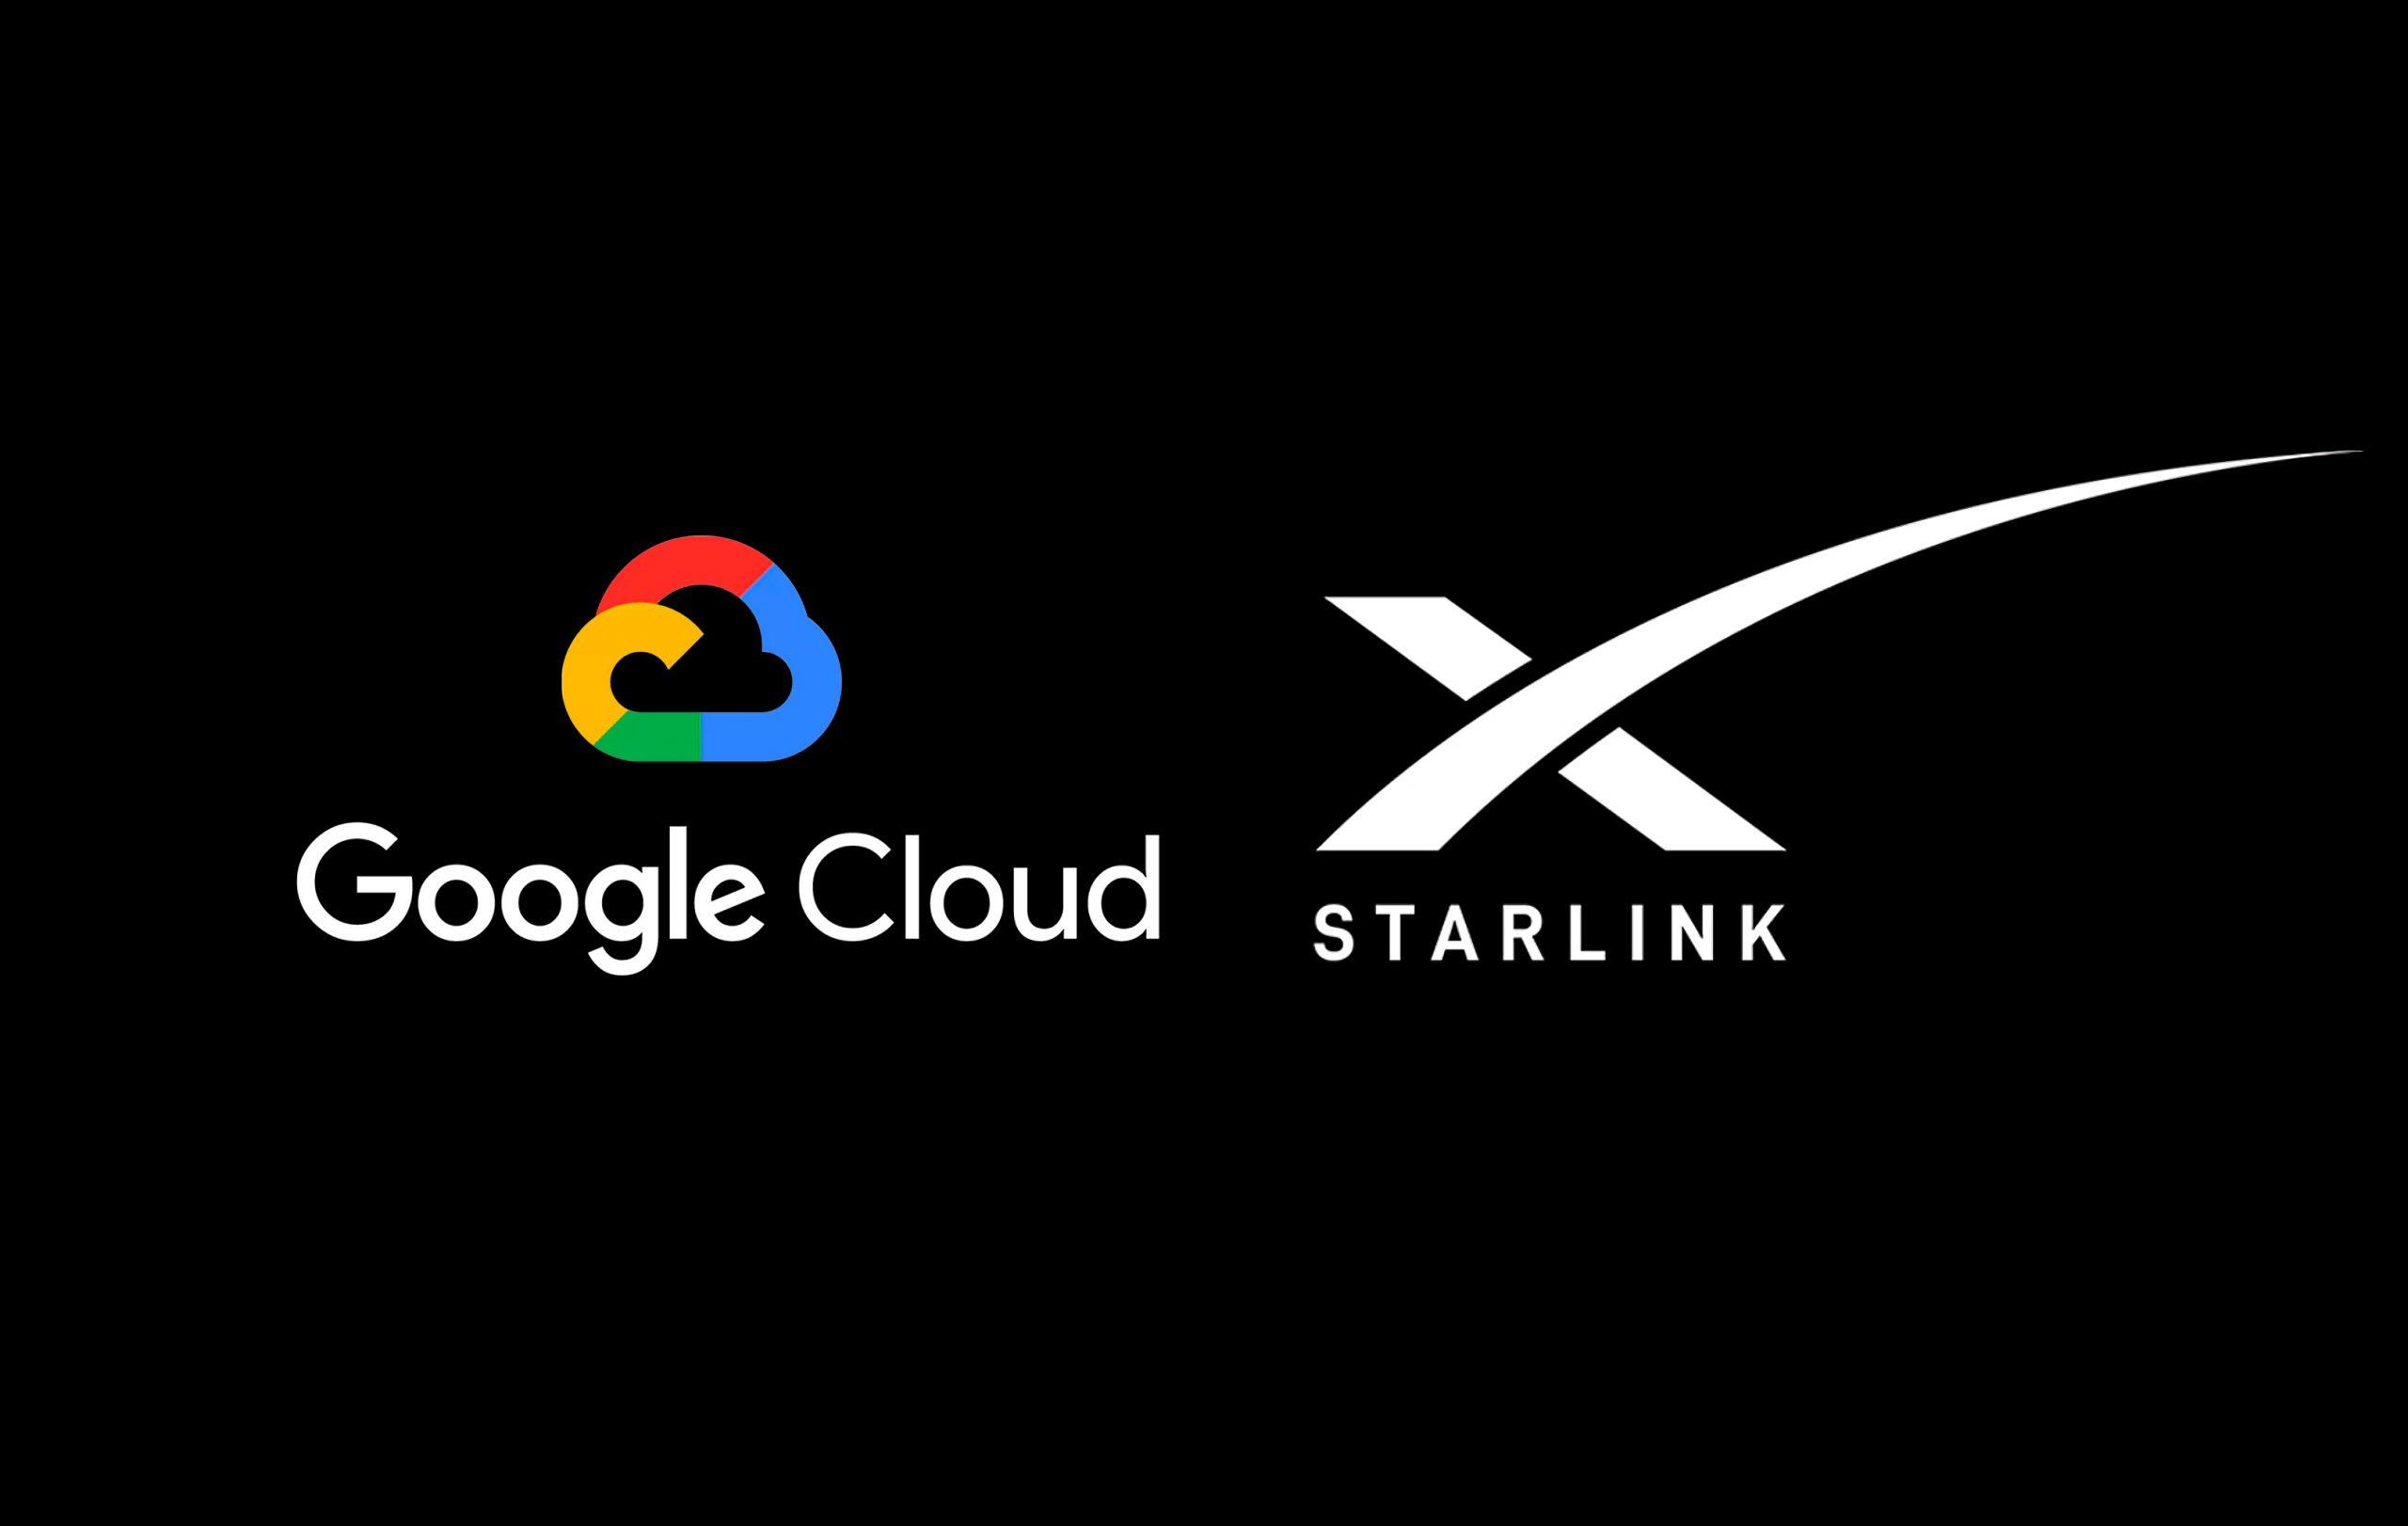 Google Starlink